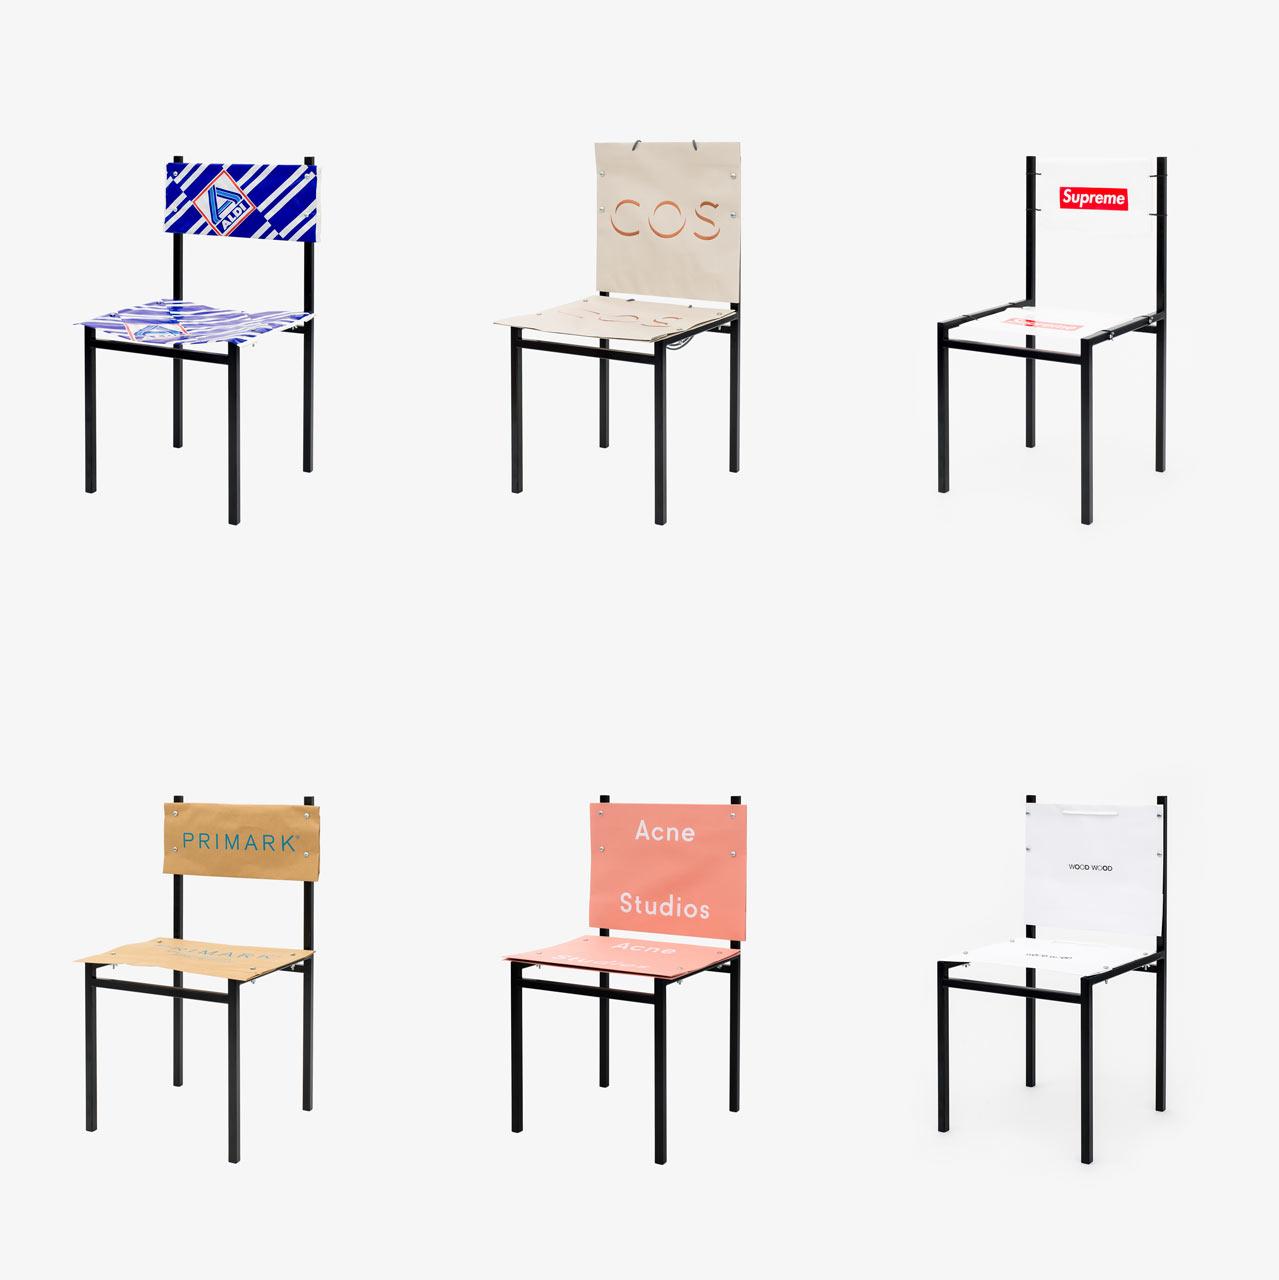 Art vs. Consumerism: shopping bags by Simon Freund